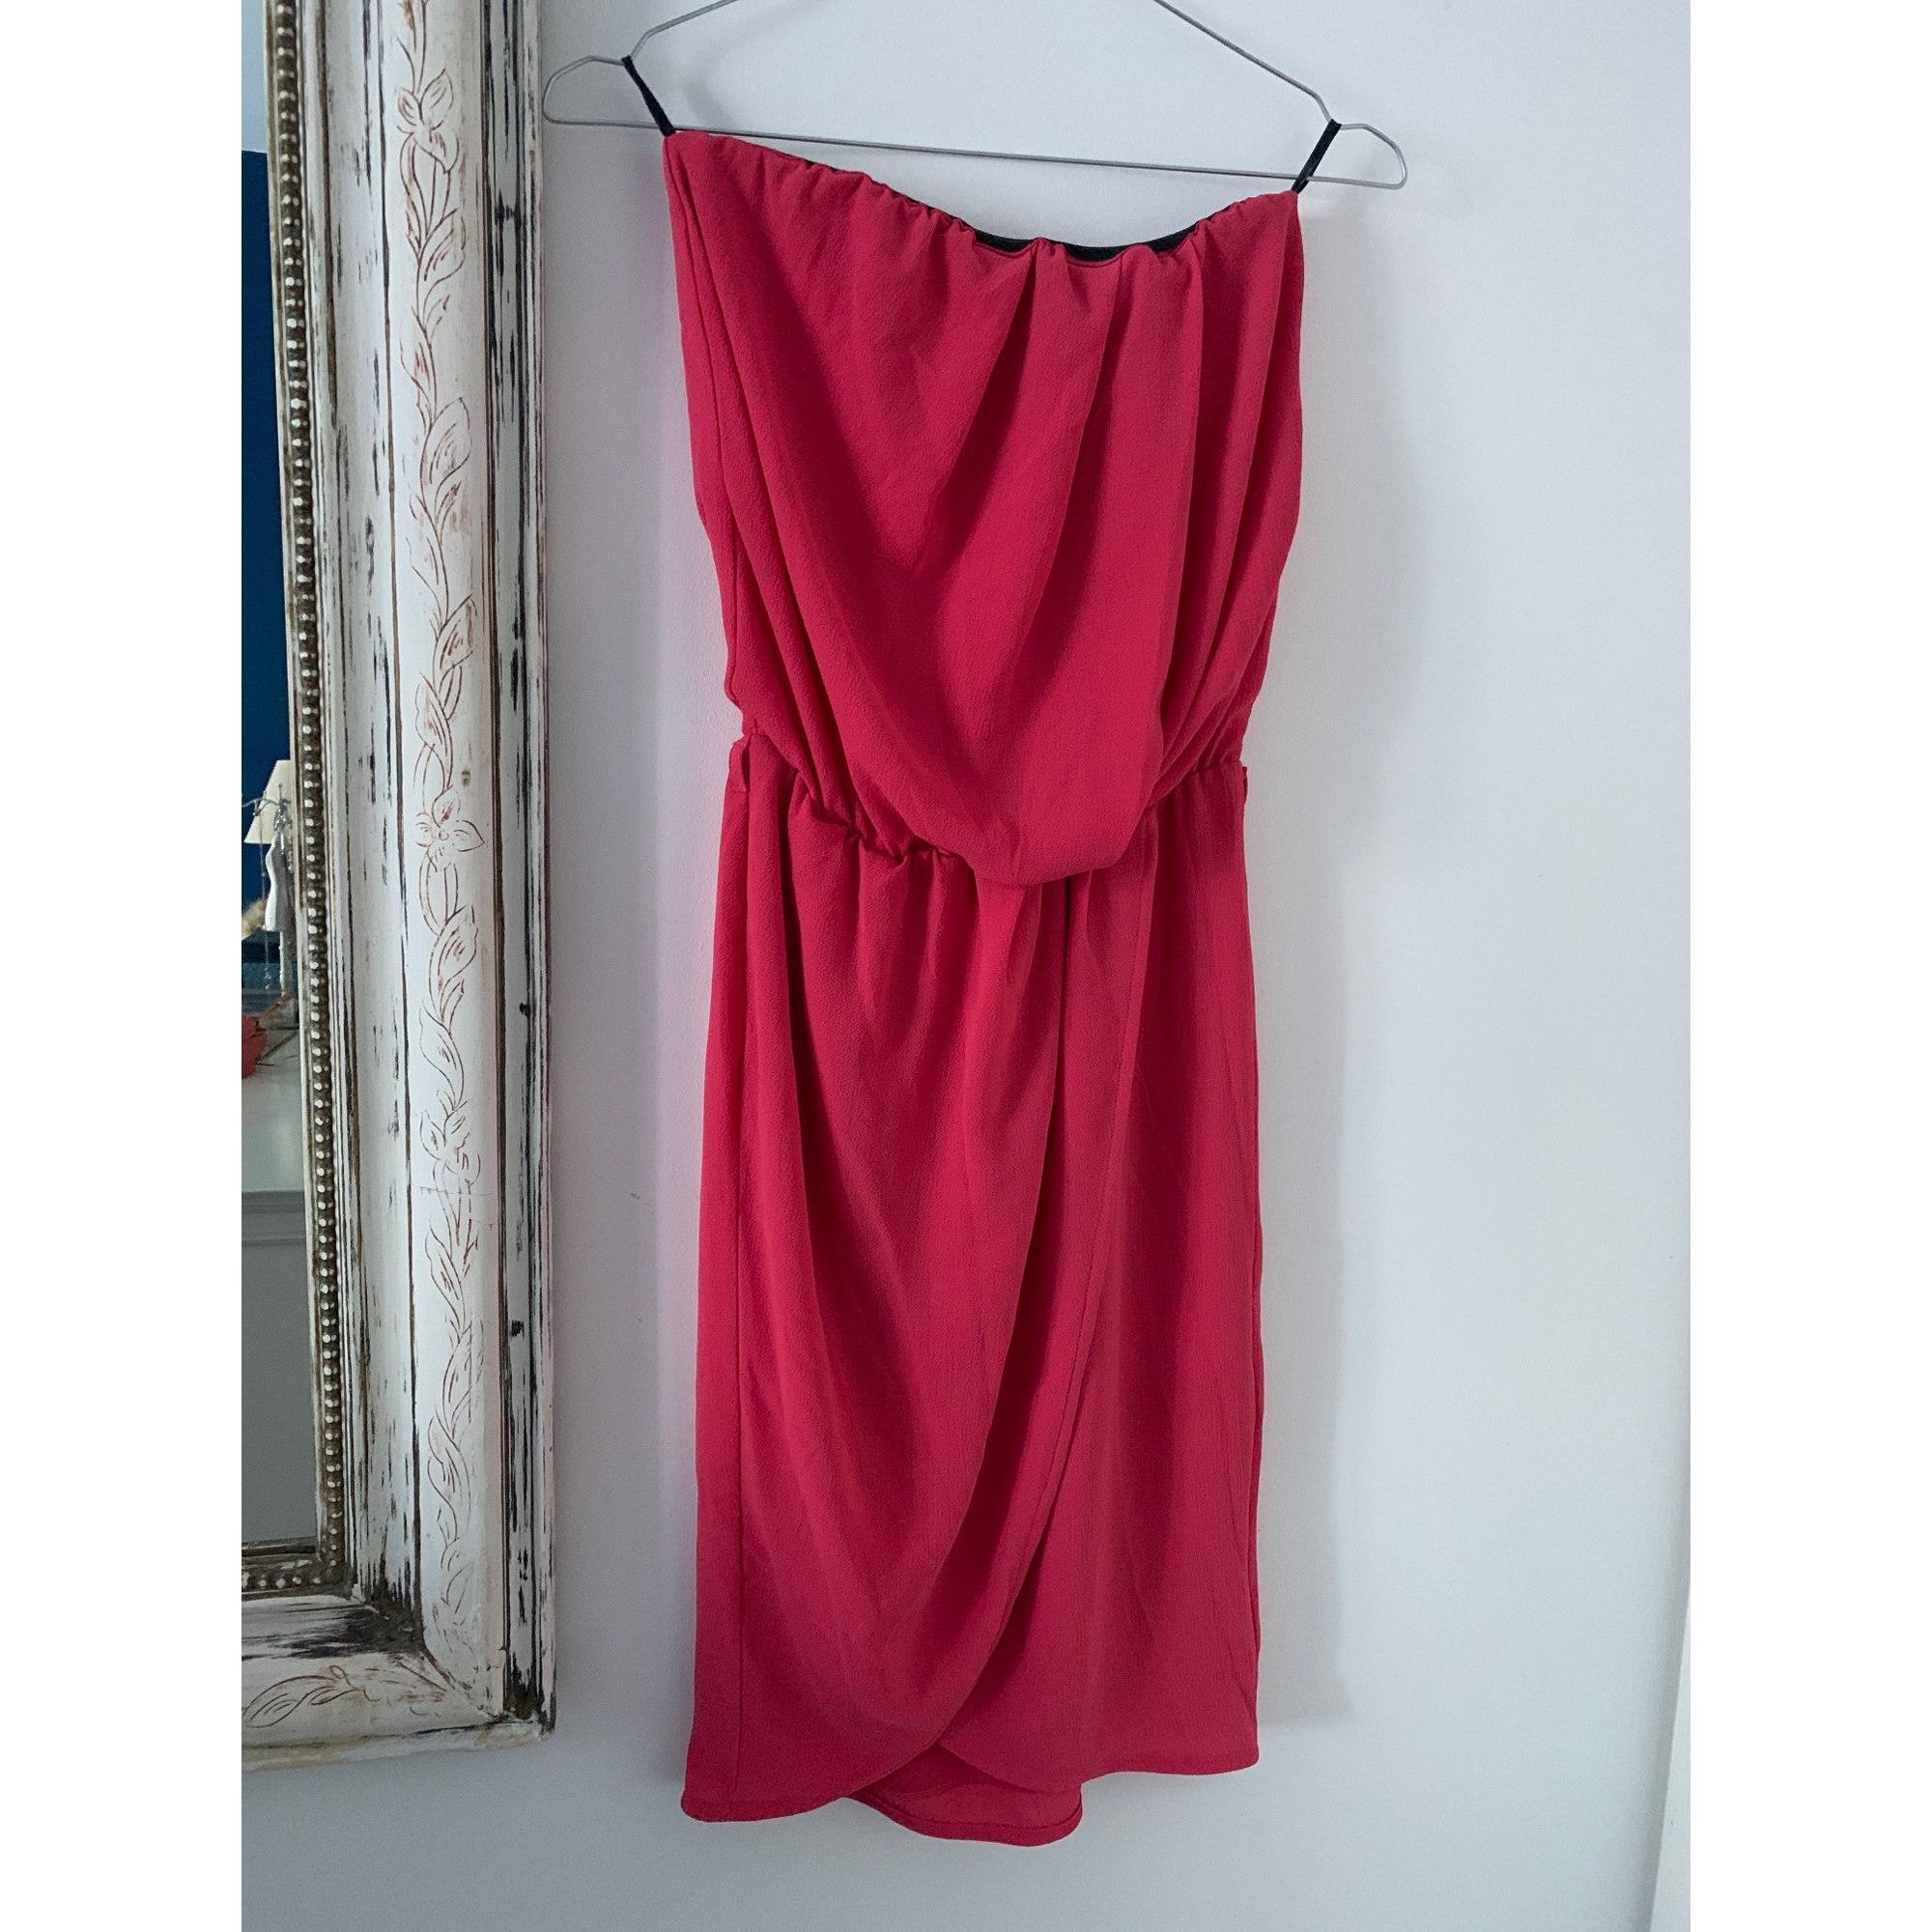 Robe bustier IKKS Rose, fuschia, vieux rose